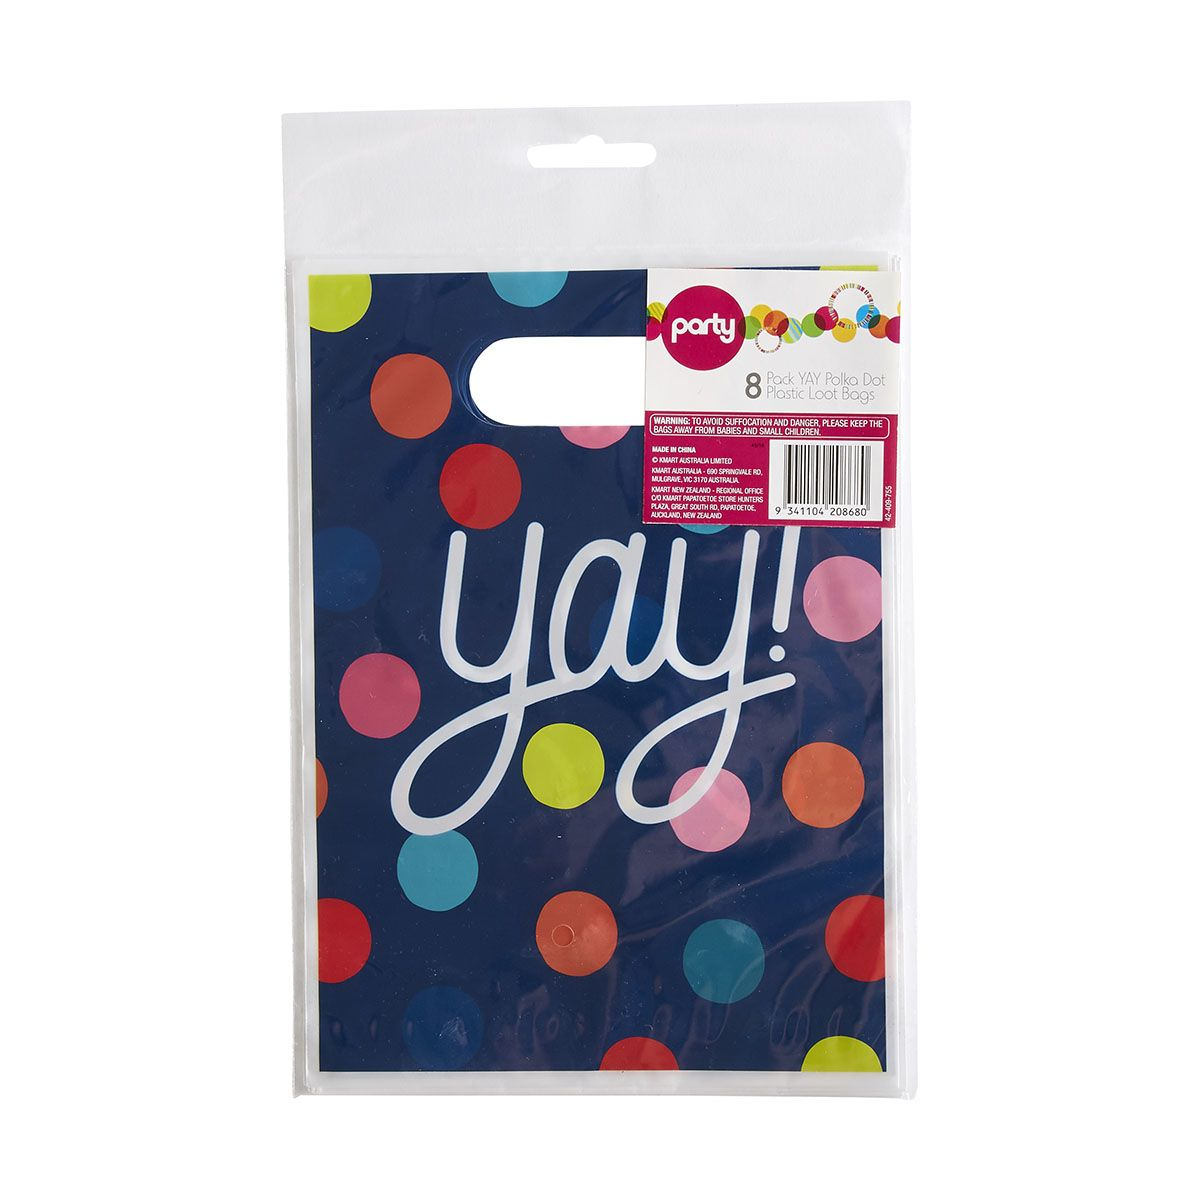 8 Pack Yay Polka Dot Plastic Loot Bags Kmart 1st